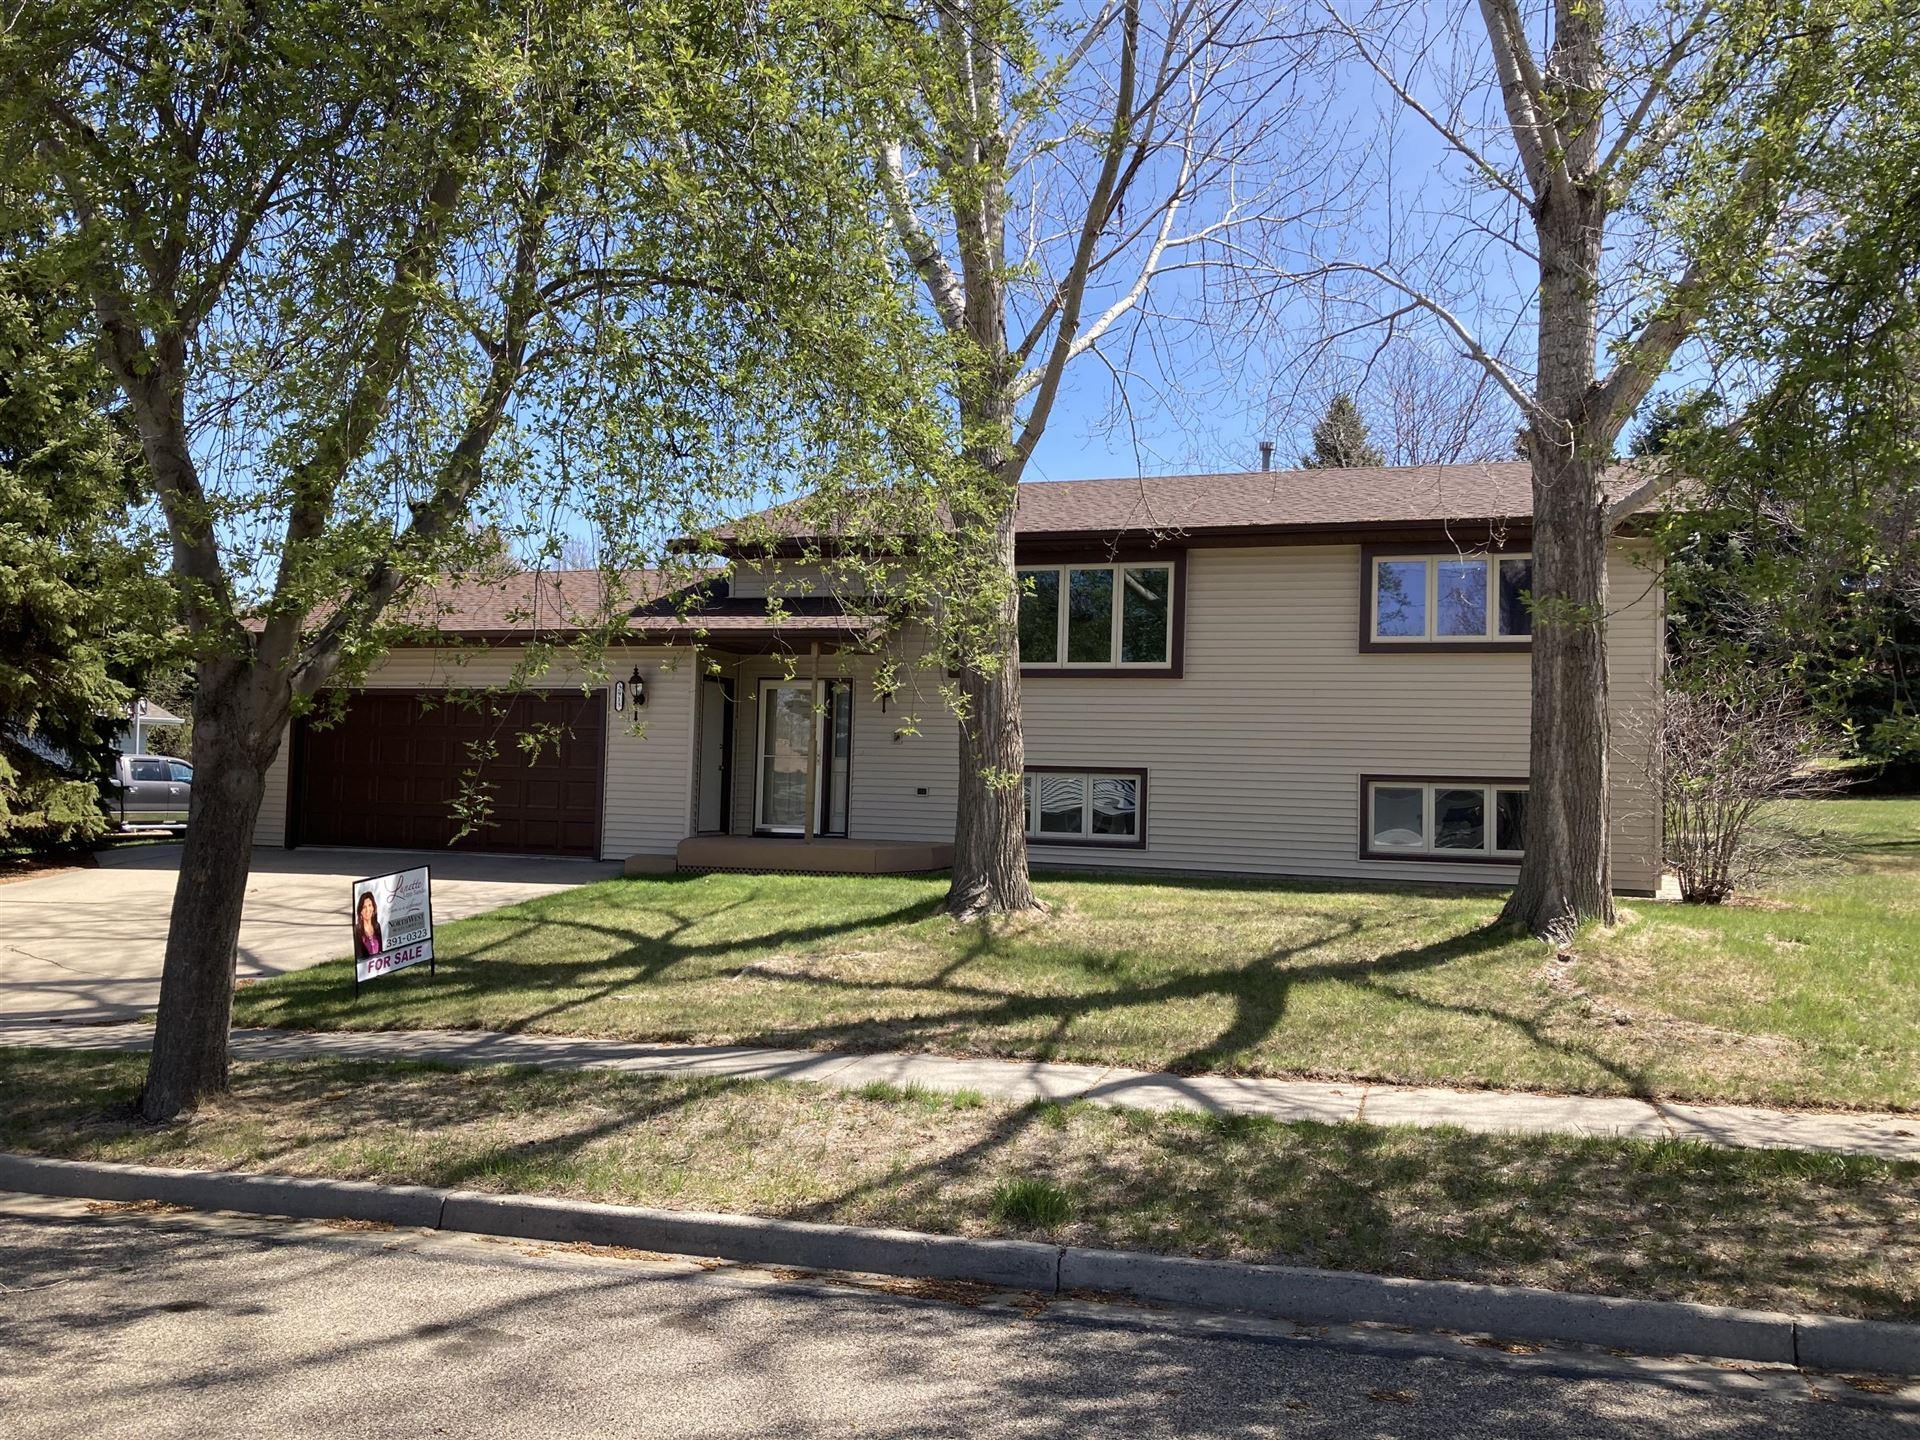 2913 Homestead Drive, Bismarck, ND 58504 - #: 410446